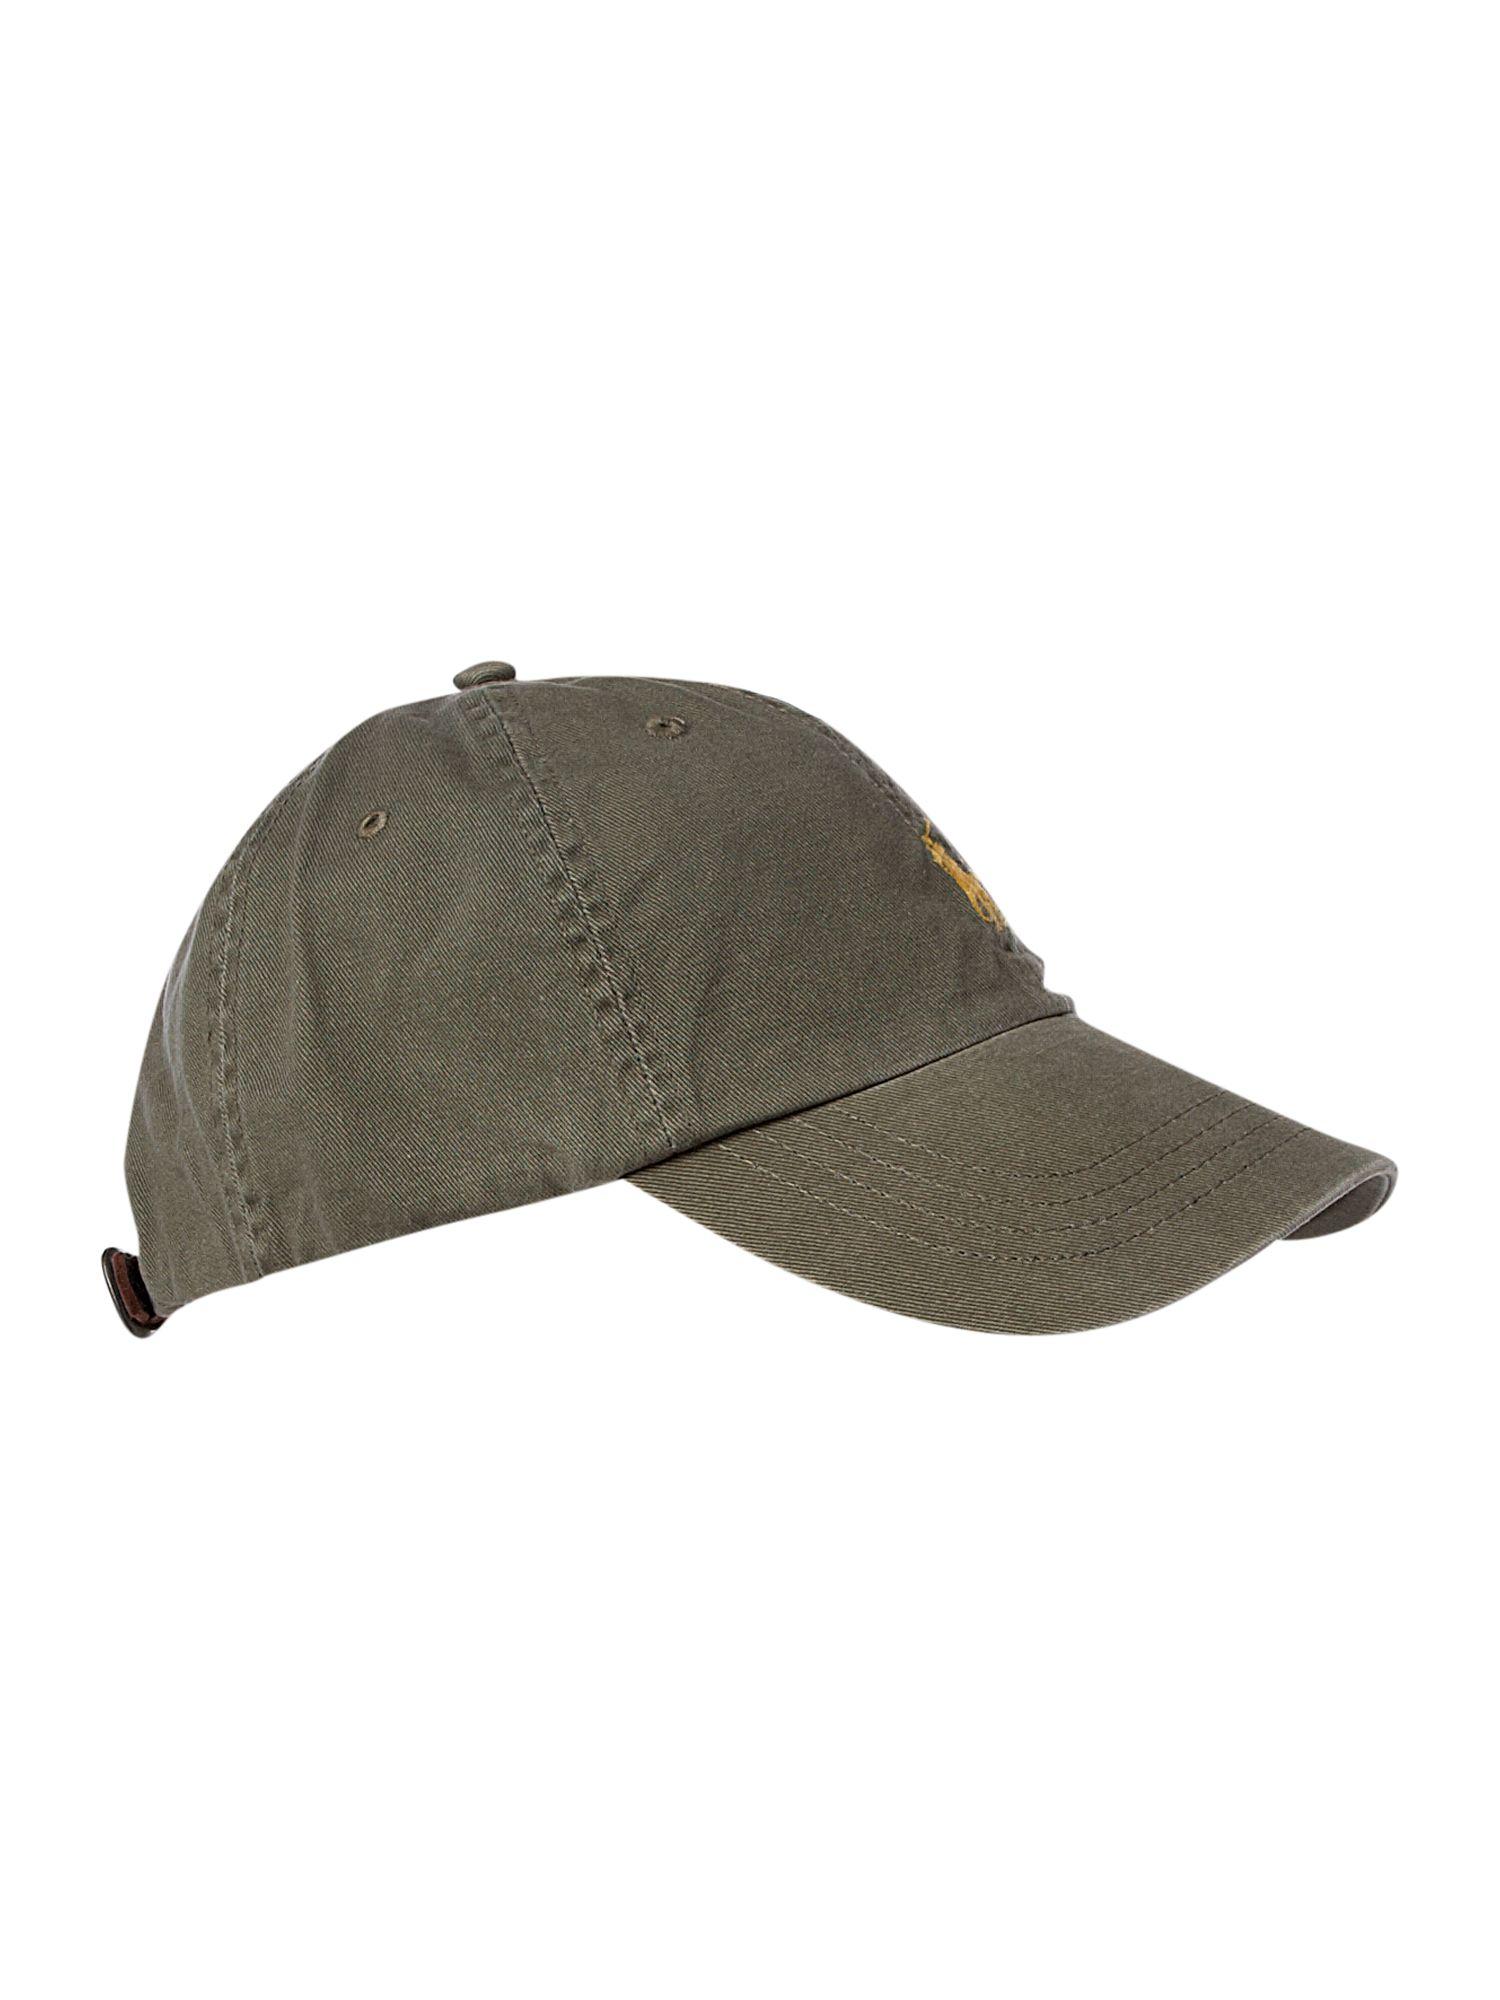 polo ralph lauren baseball cap in green for men dark green lyst. Black Bedroom Furniture Sets. Home Design Ideas